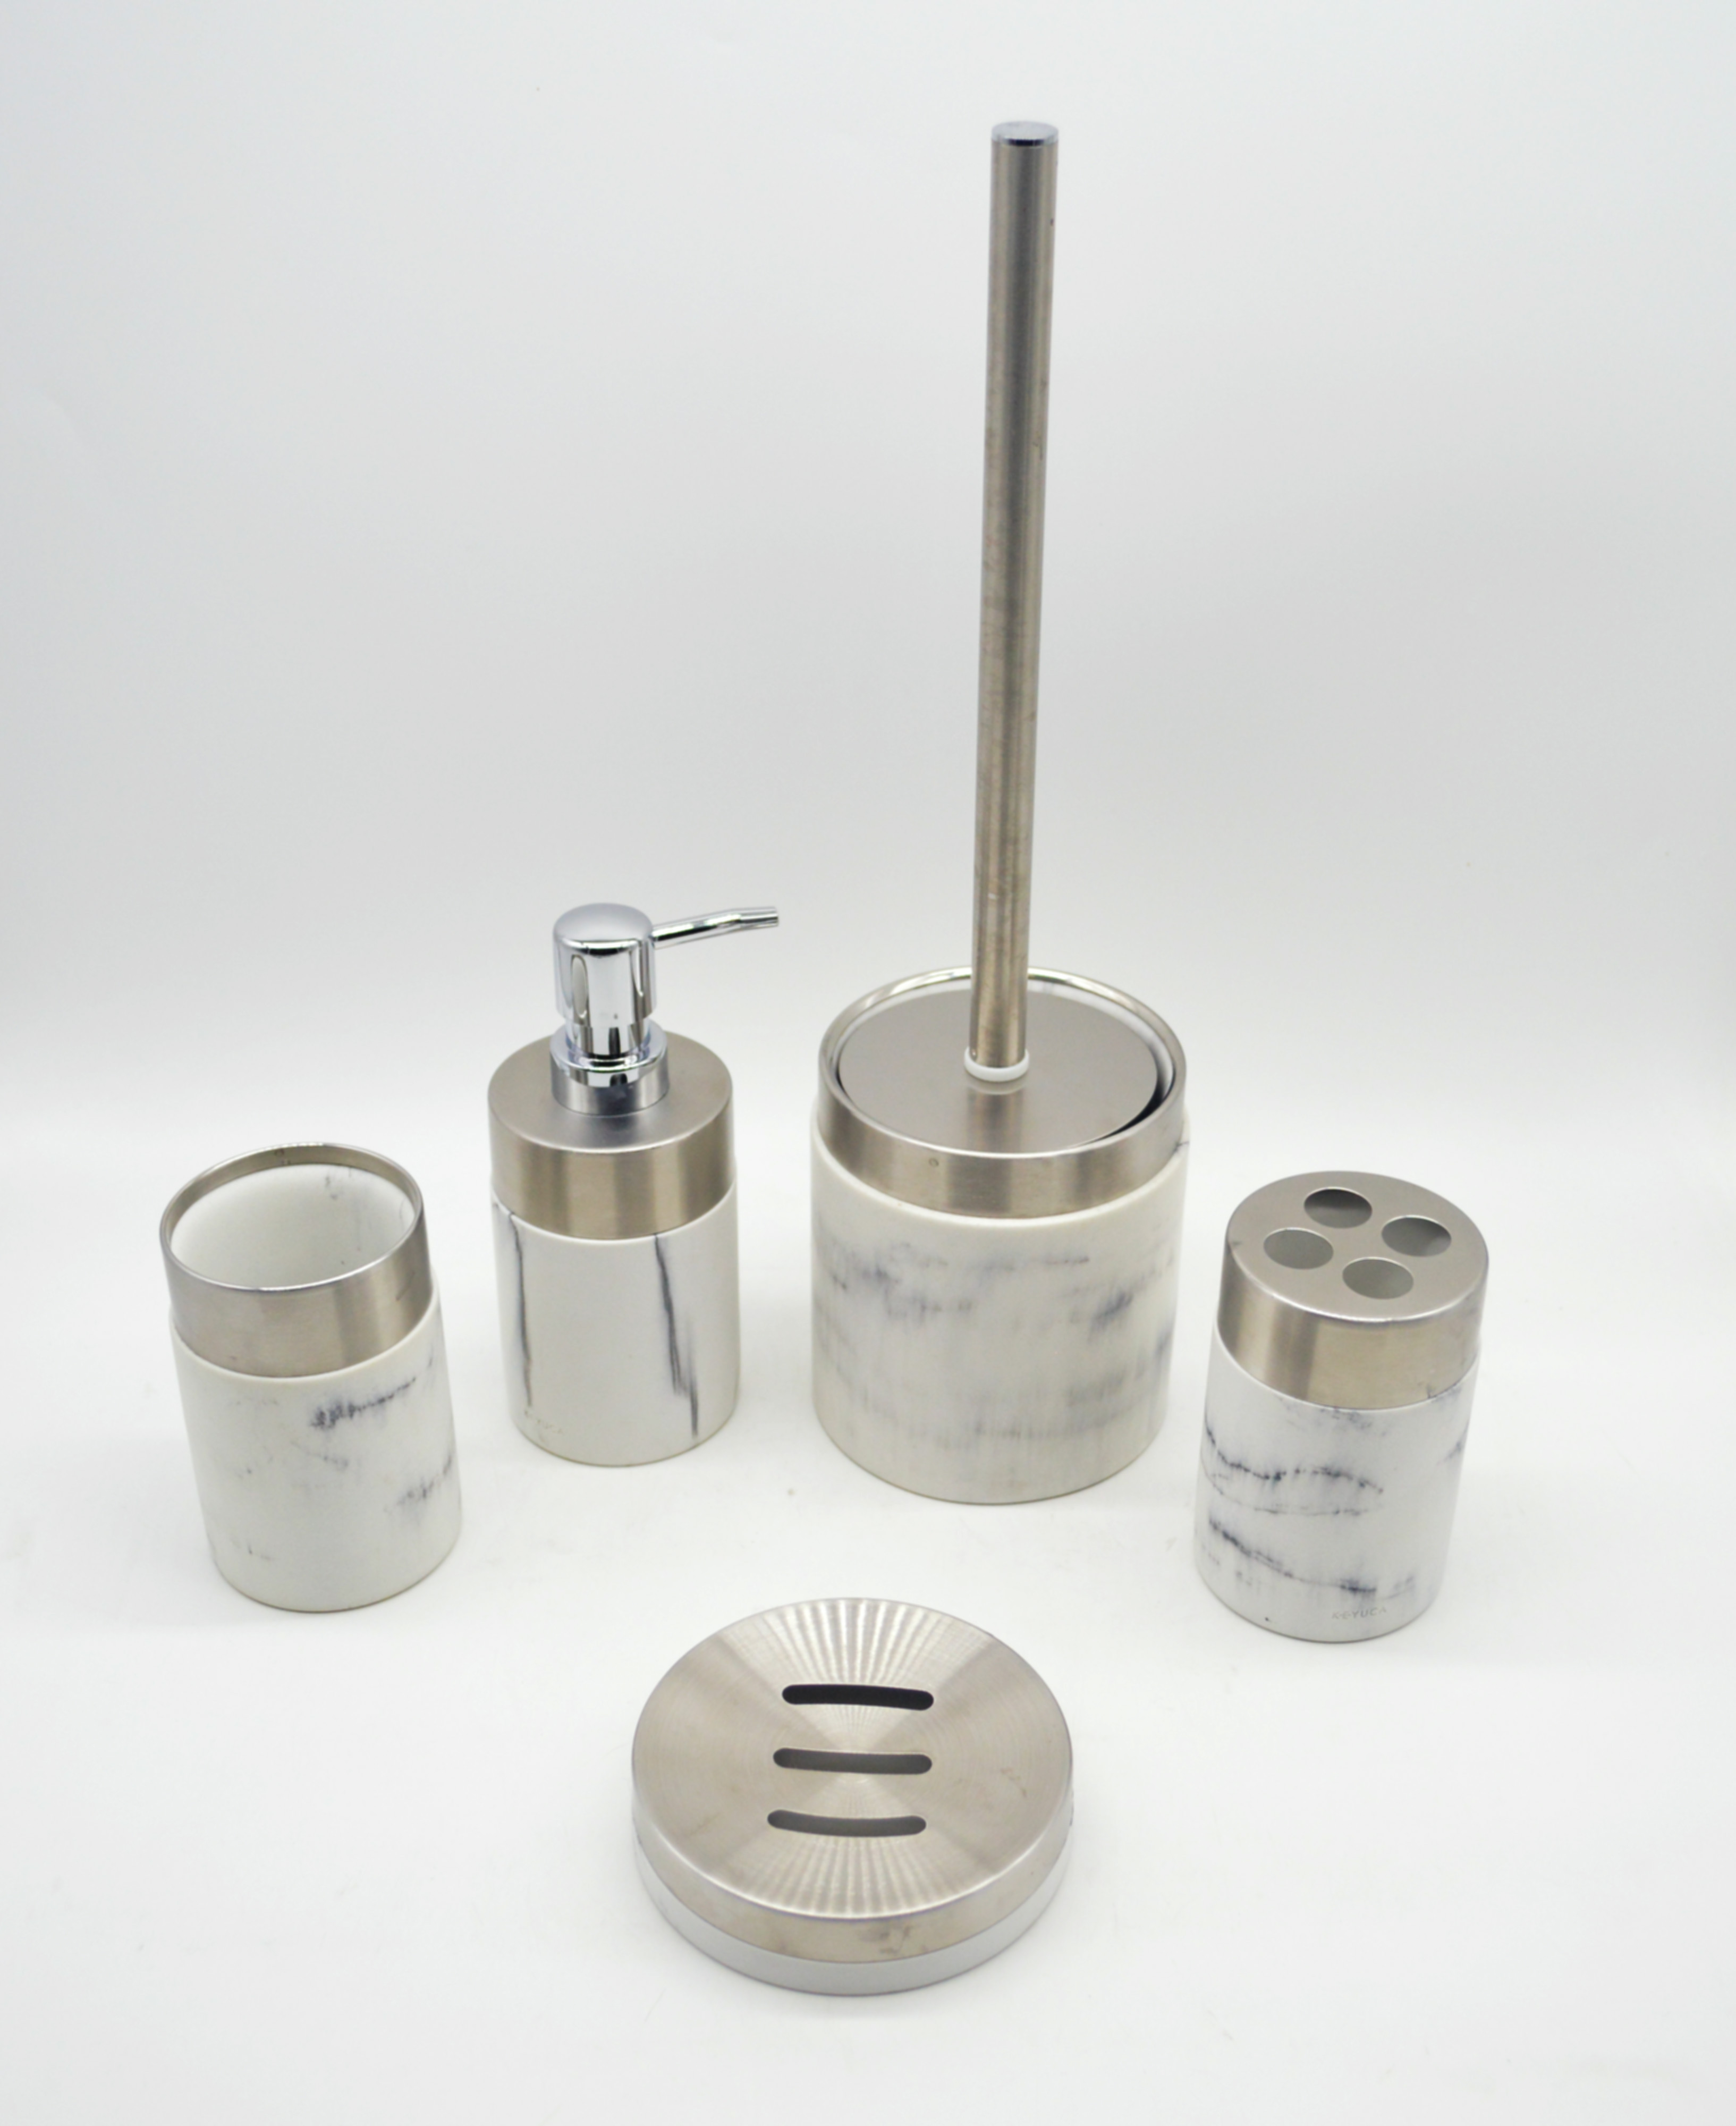 Ambiente Exhibitors Products Hongkong Hongbao Enterprise Limited Marble Bathroom Accessories Set